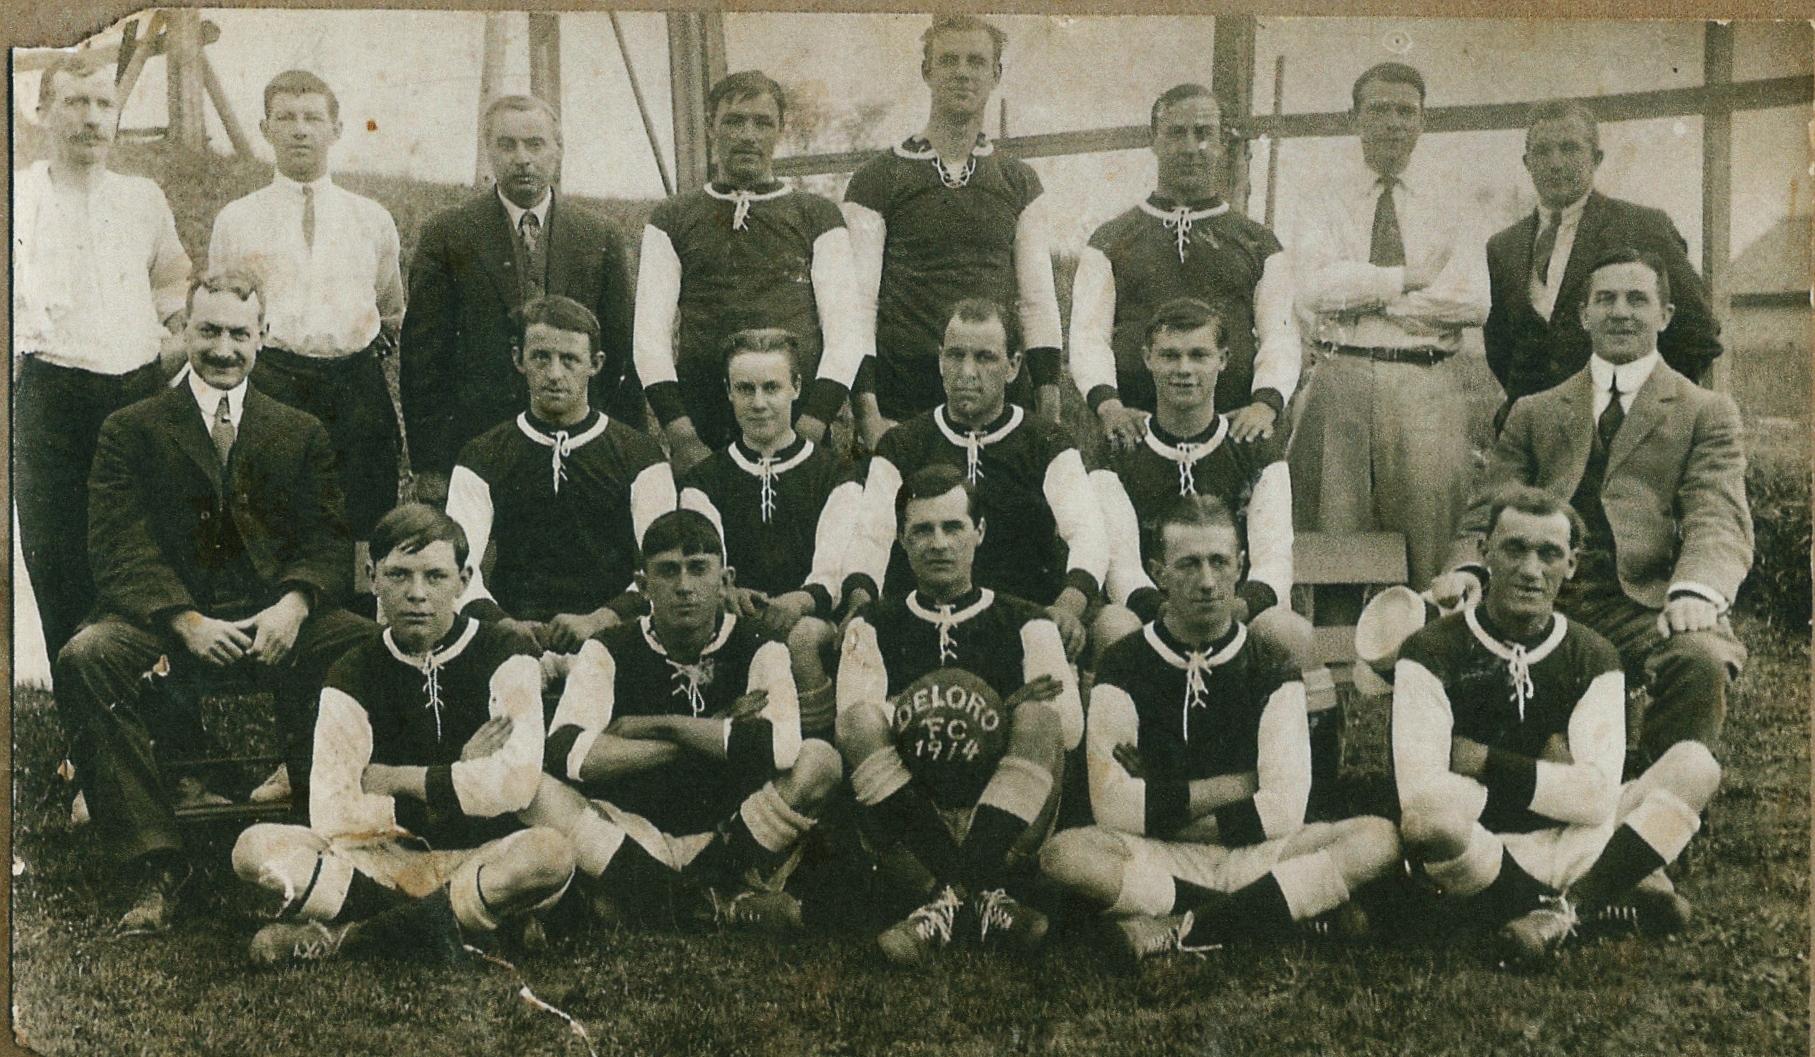 Deloro Football Team1914